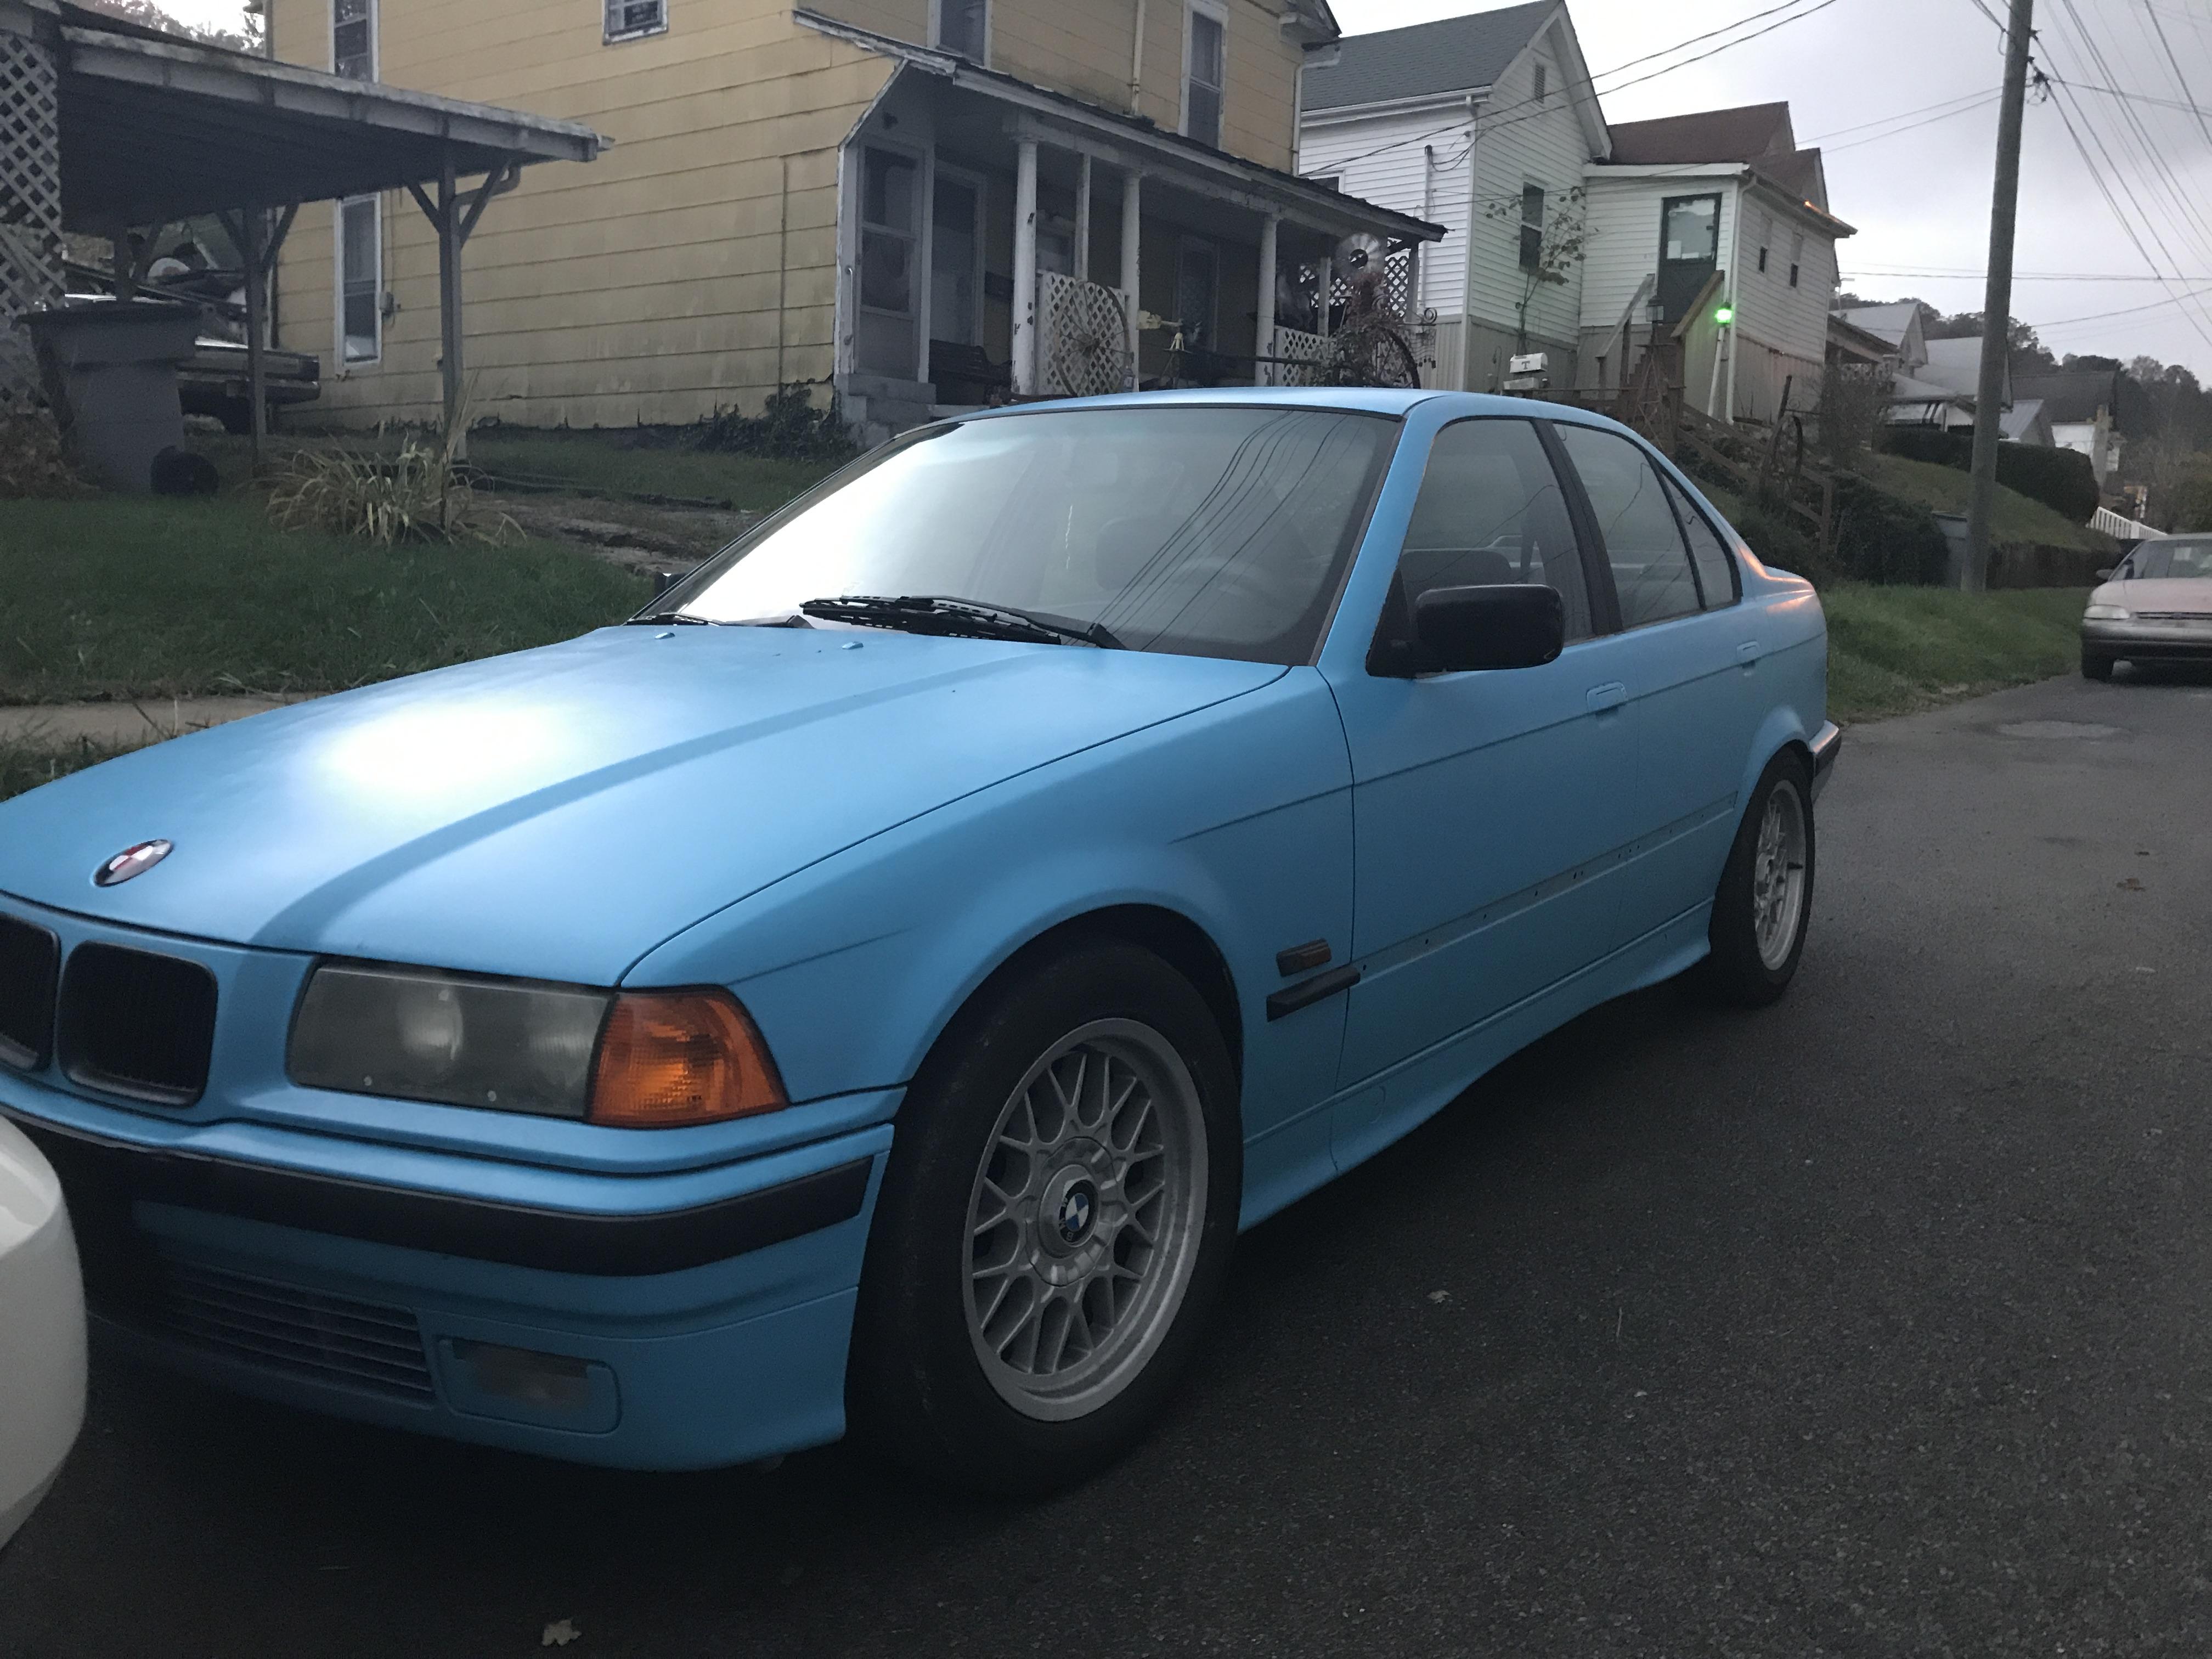 Paint BMW 325i back black